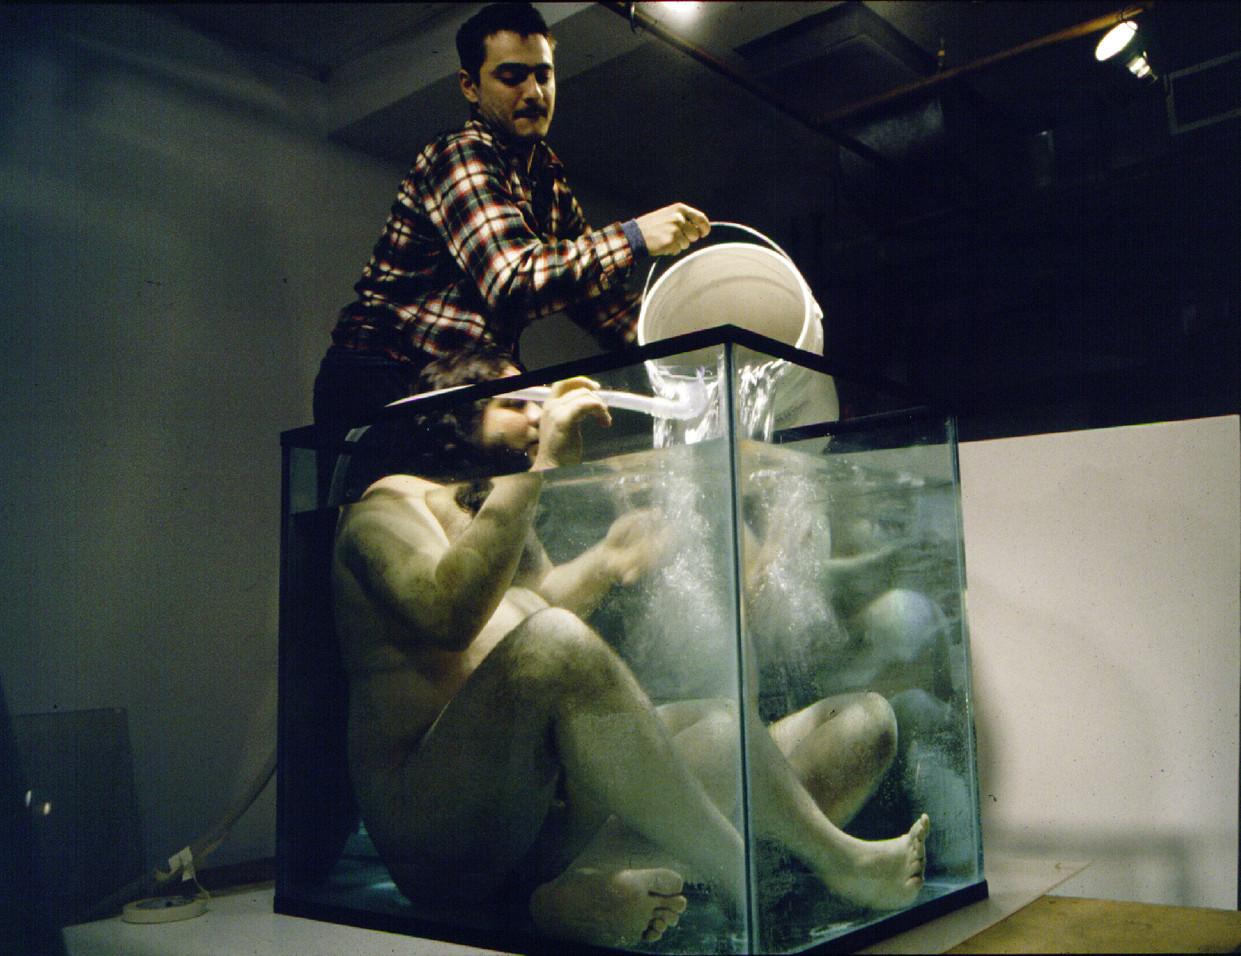 Pandora's Box 2000